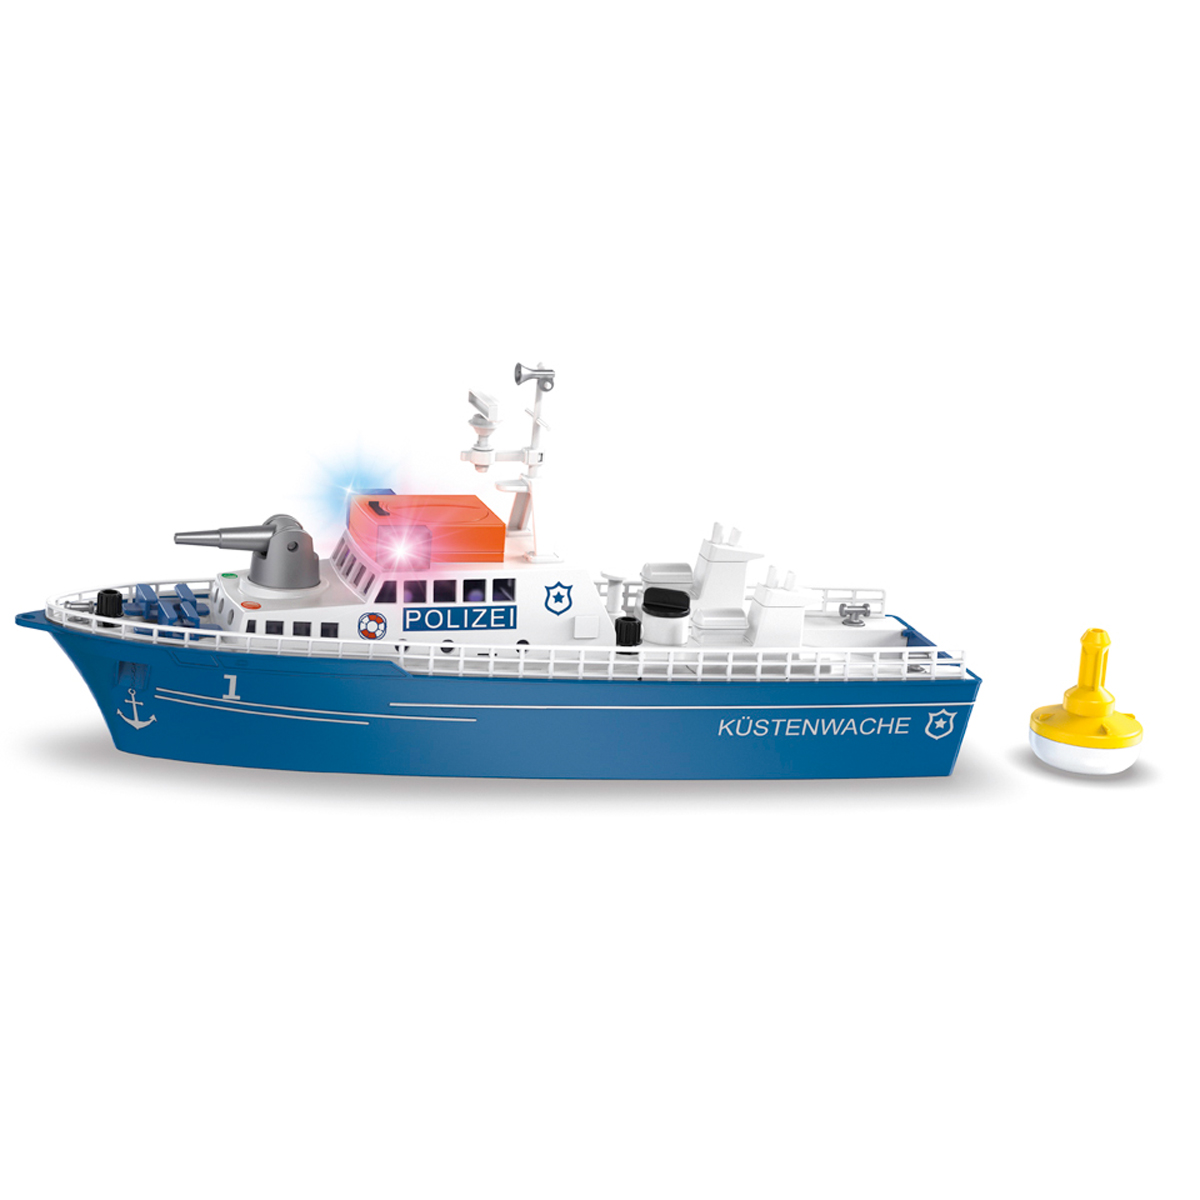 SIKU WORLD ポリスボート